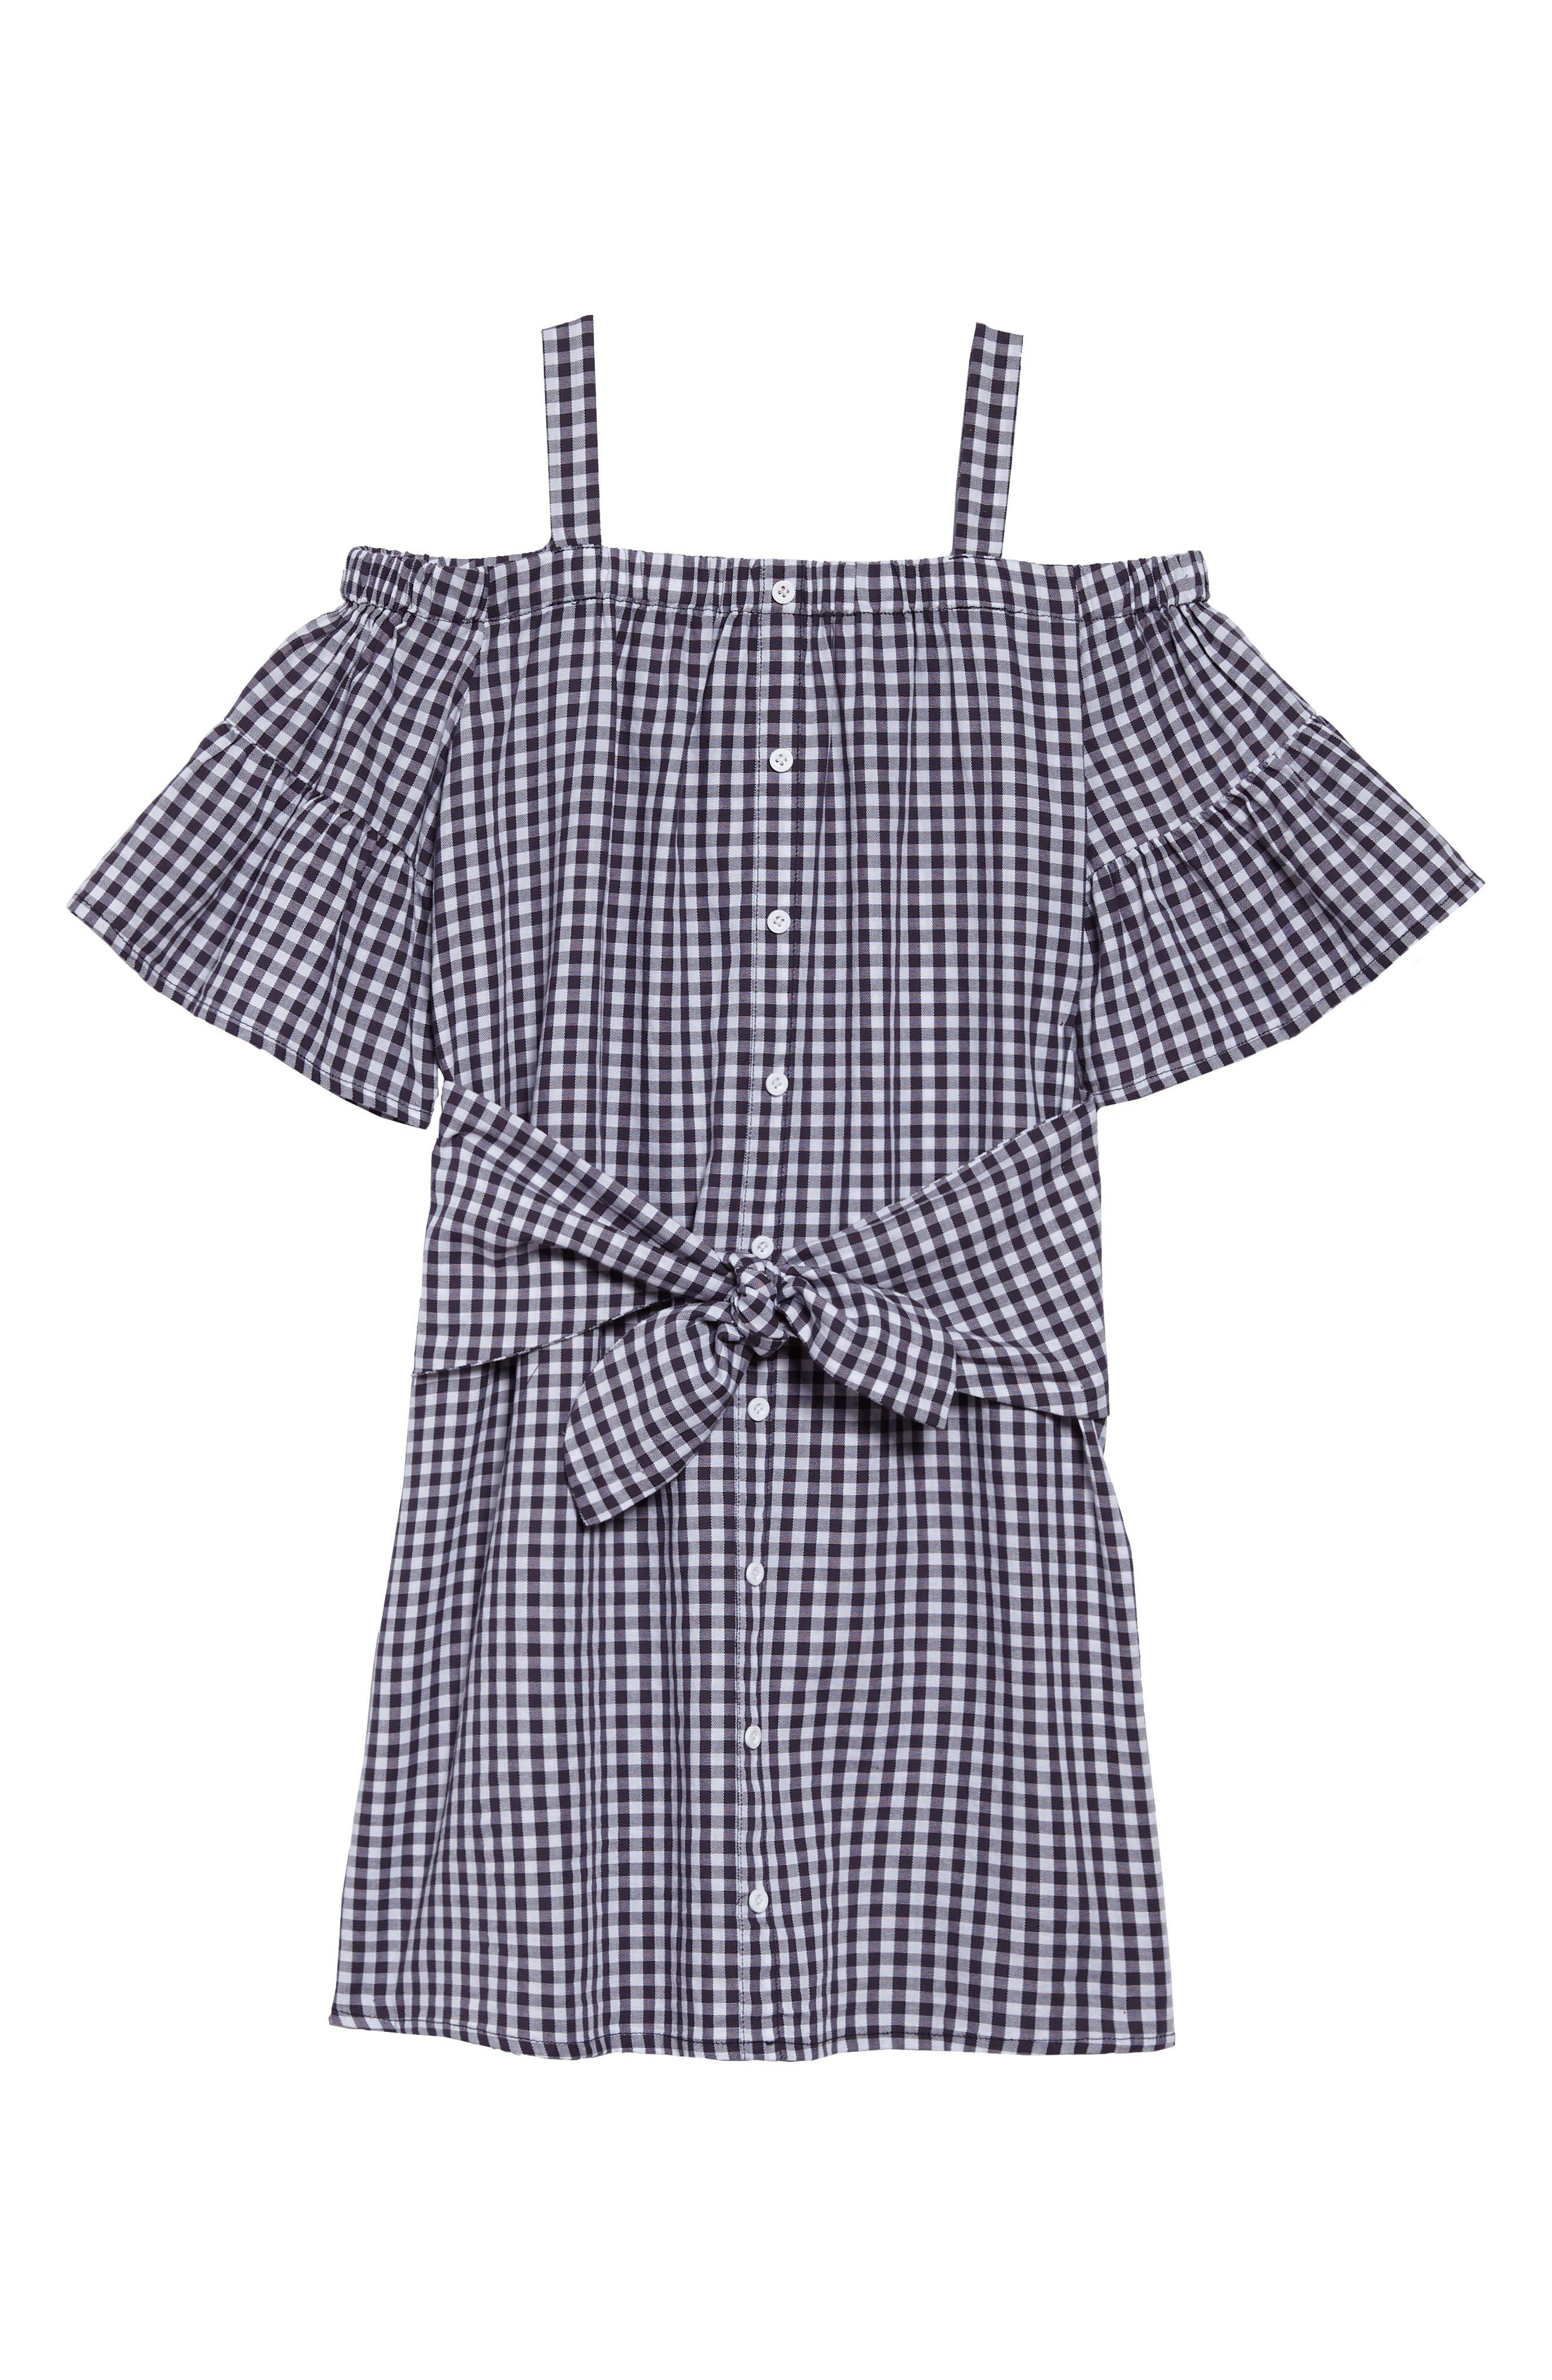 Jenny Check Cold Shoulder Dress,                         Main,                         color, 001